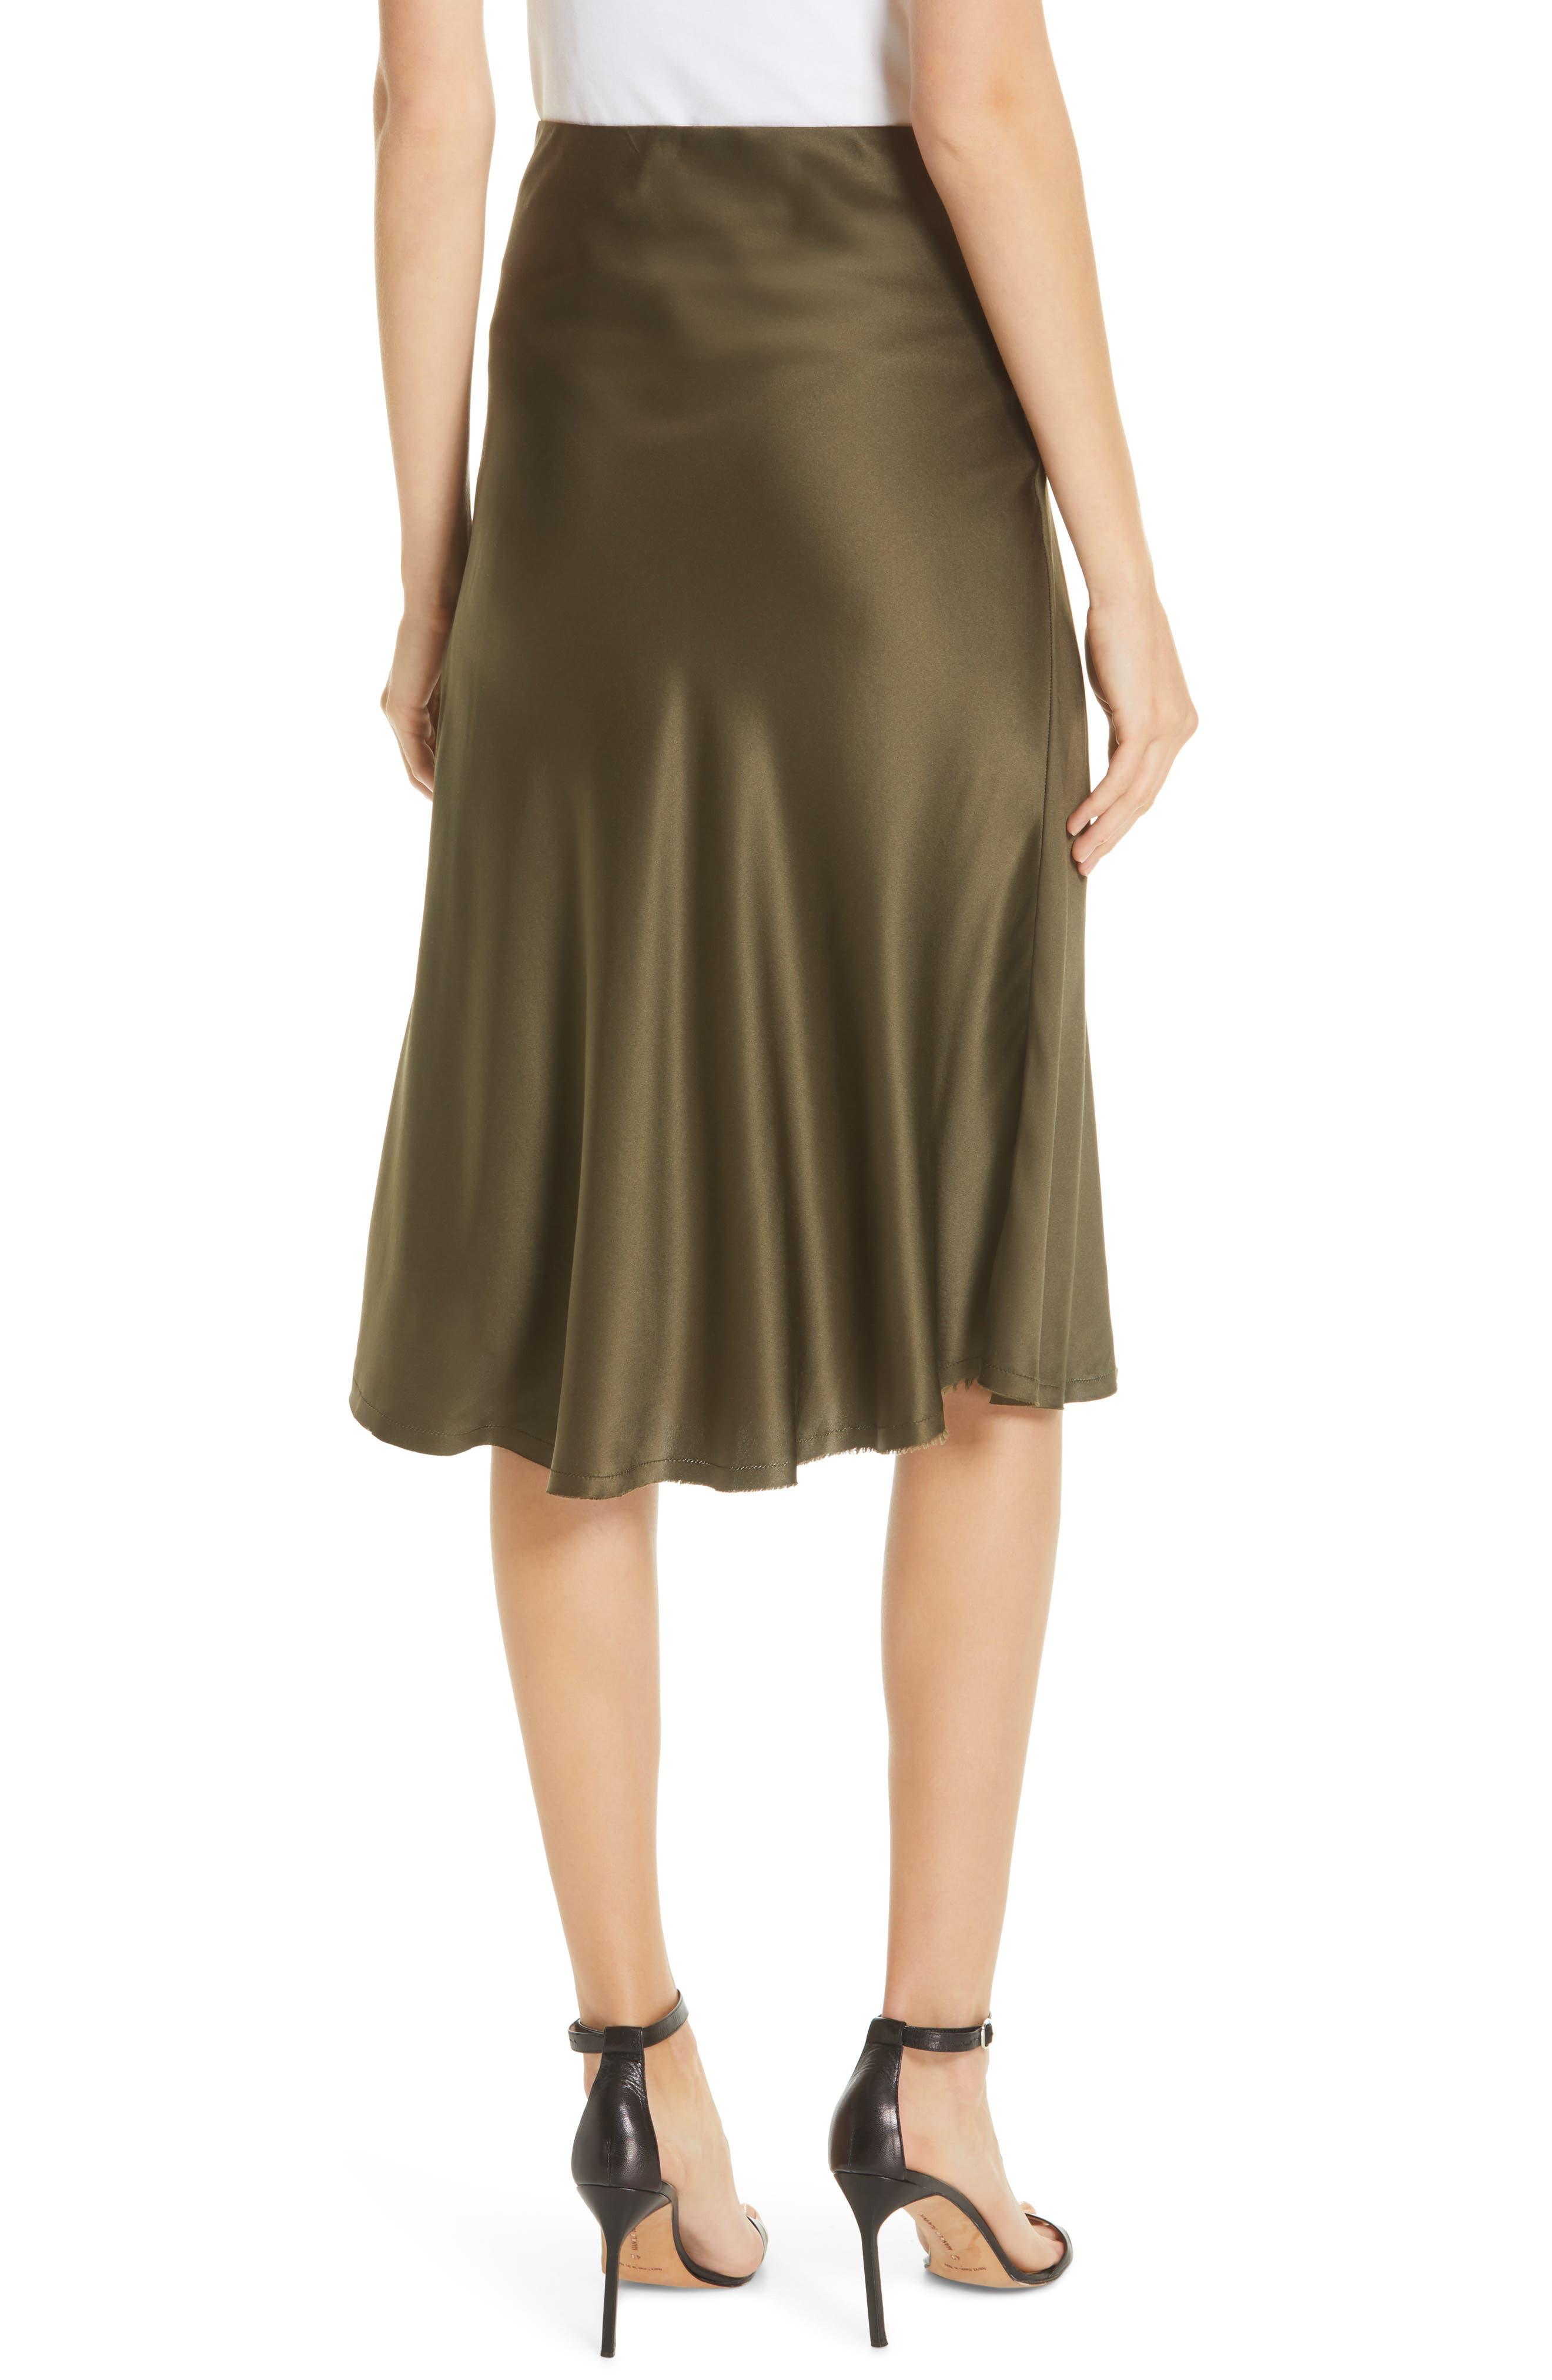 NILI LOTAN, Lane Silk Skirt, Alternate thumbnail 2, color, ARMY GREEN